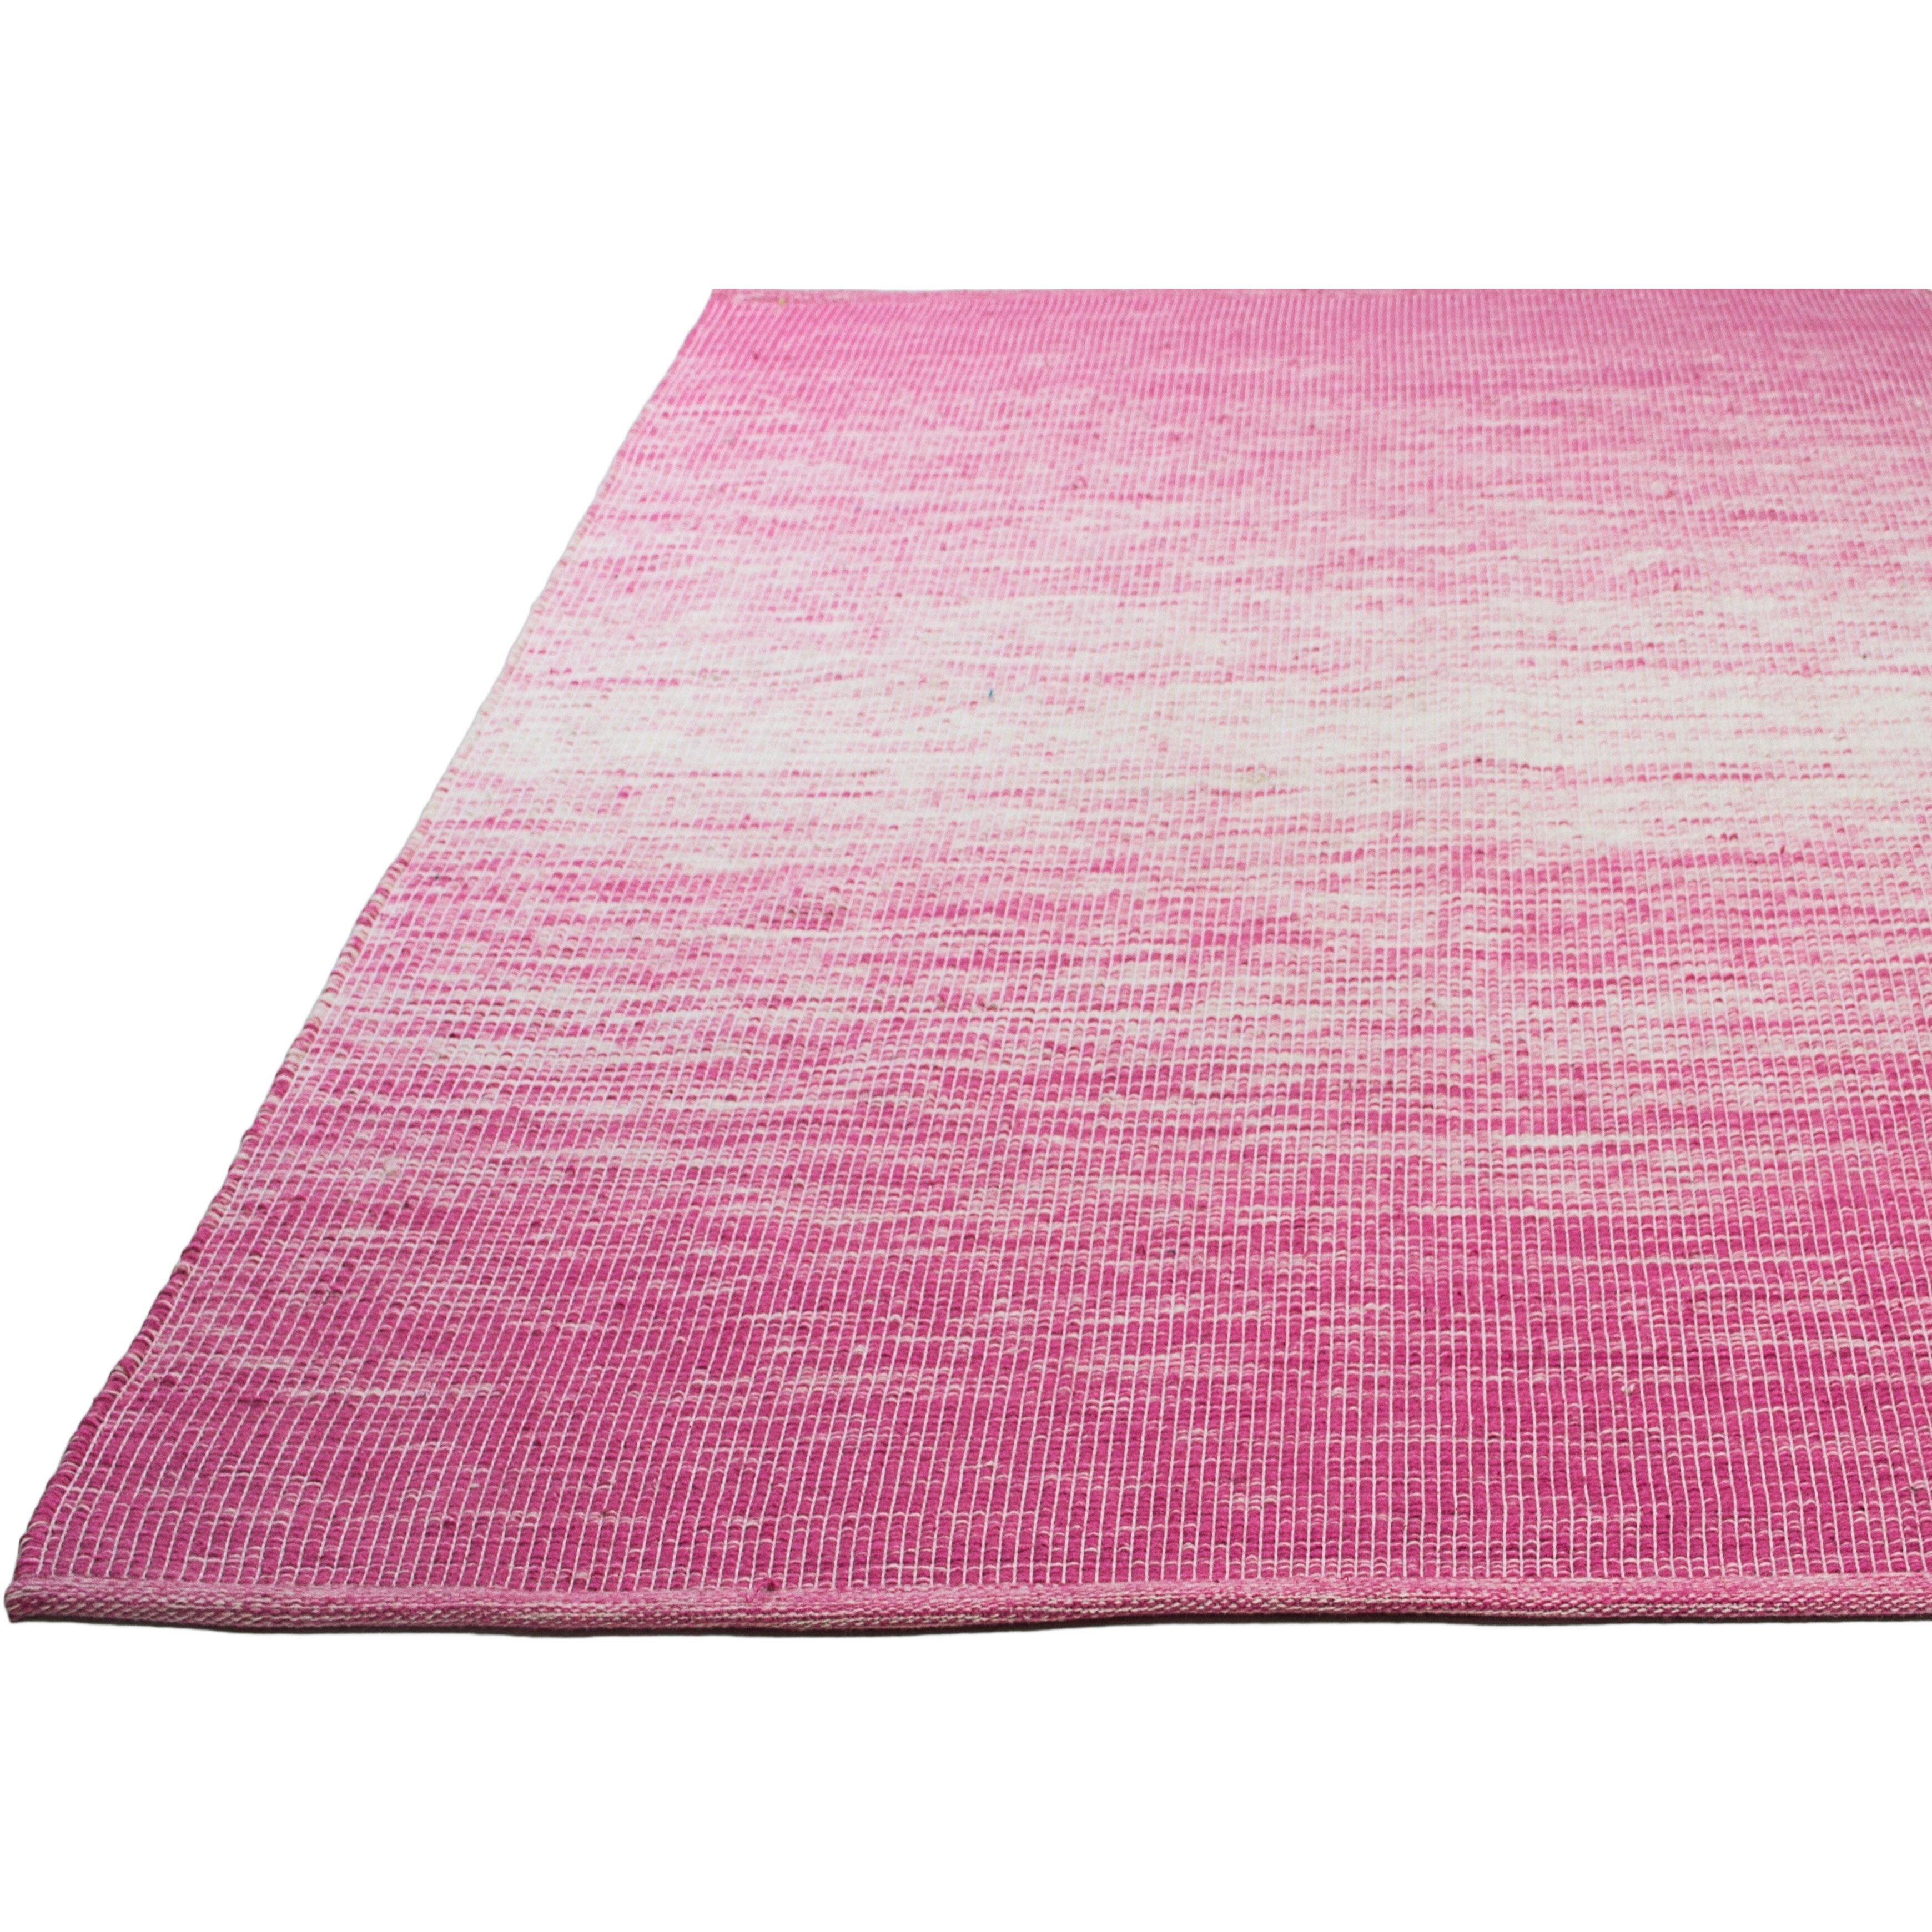 fab rugs estate hand woven pink indoor outdoor area rug. Black Bedroom Furniture Sets. Home Design Ideas